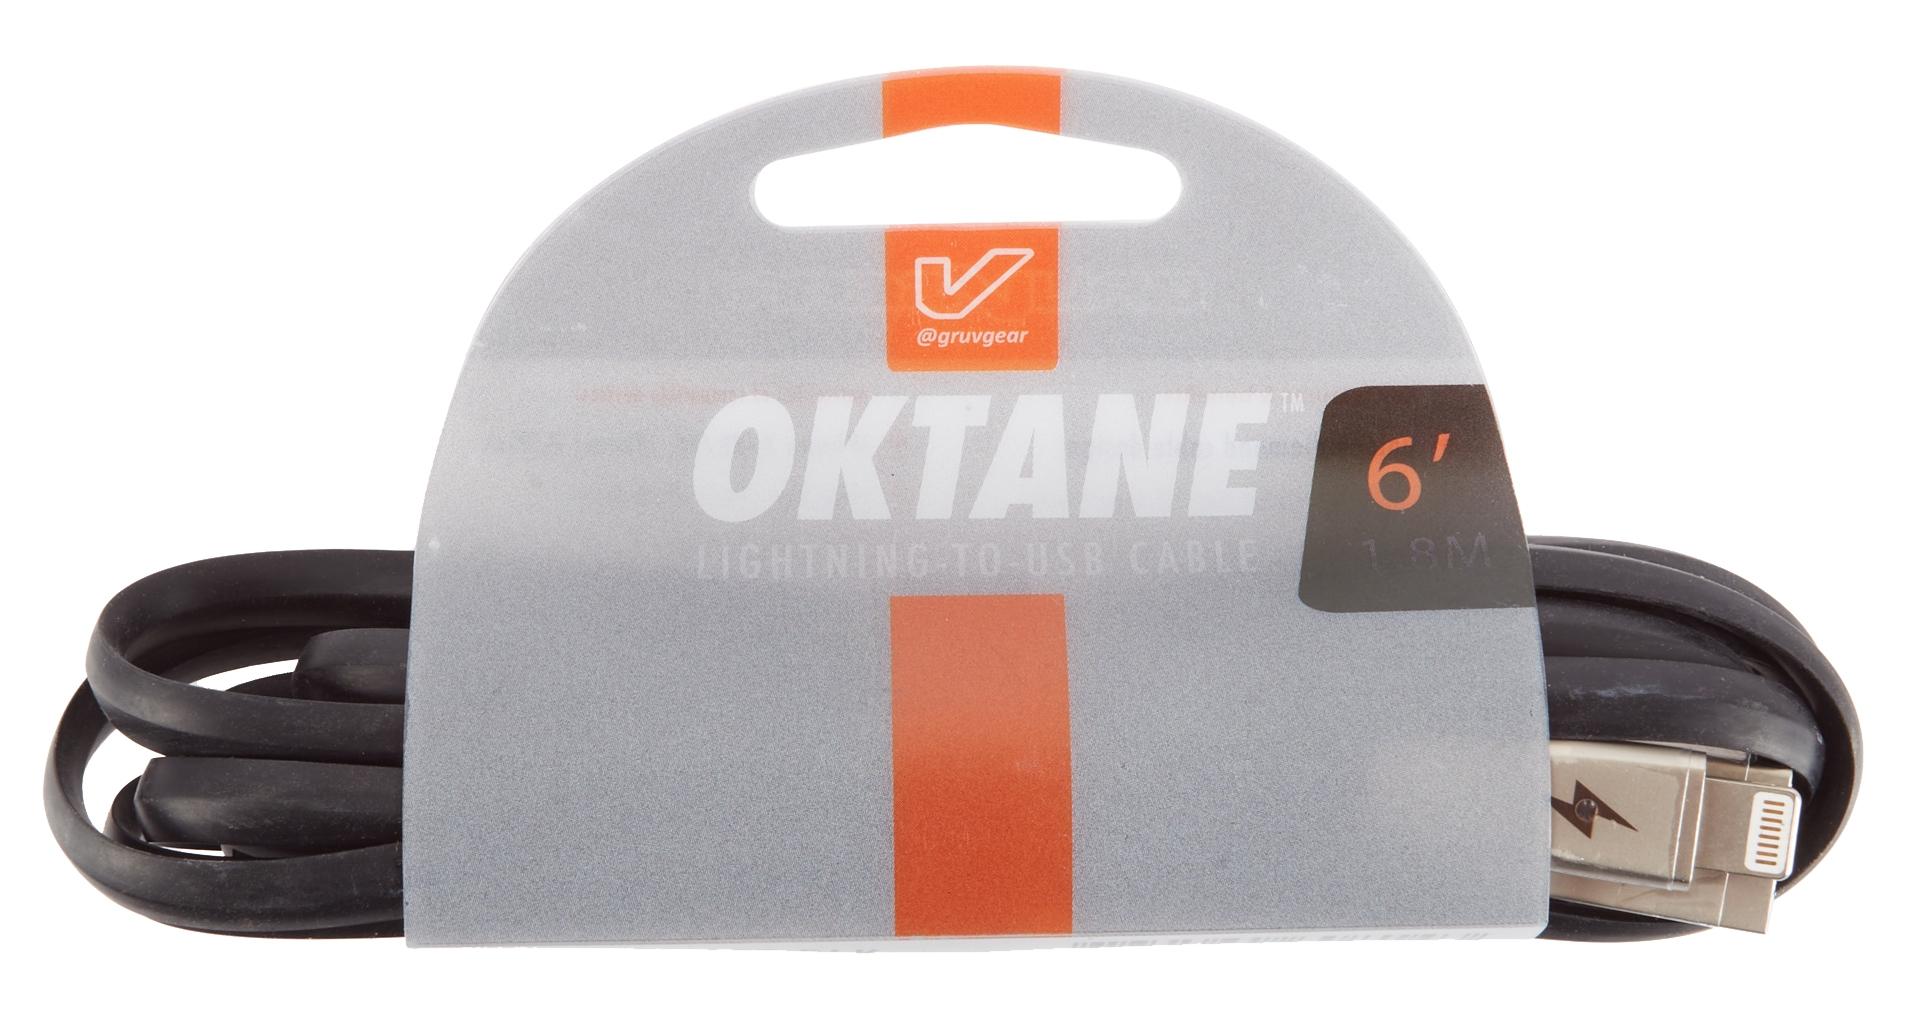 GRUVGEAR Oktane Charging Cable Lightning 4'